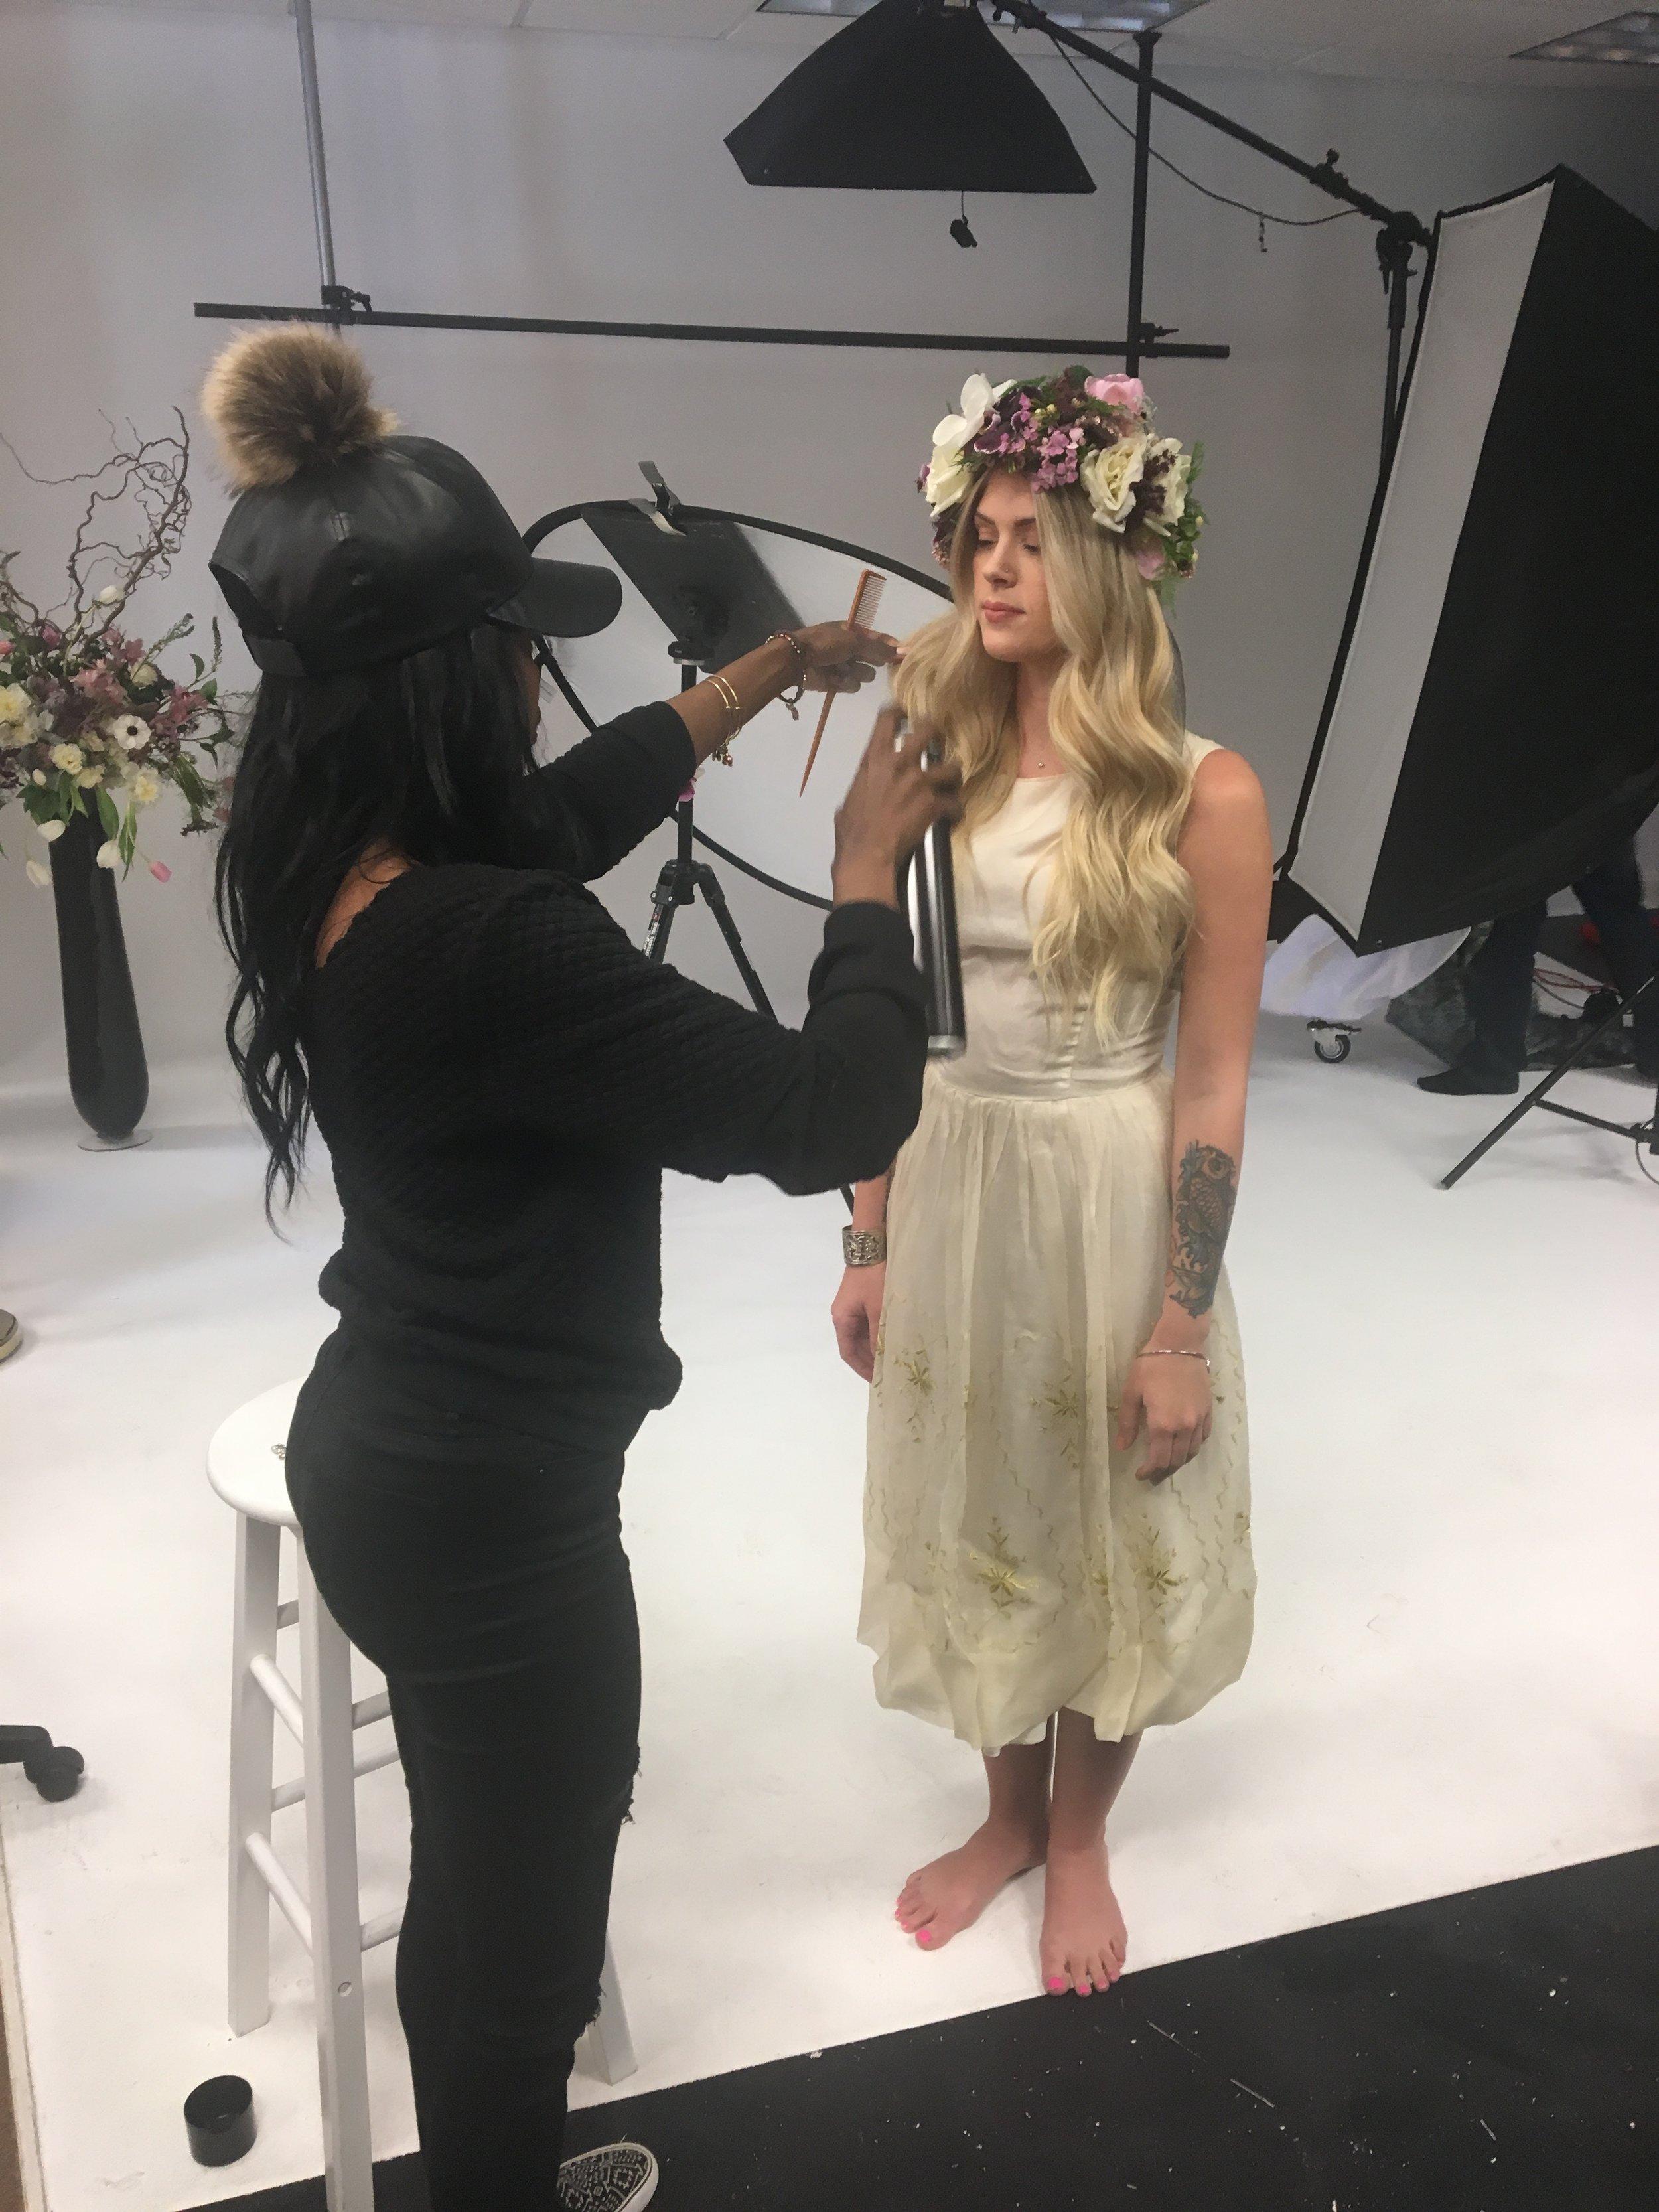 Bridal Model Sam- Spring Wedding Hair & Makeup Shoot